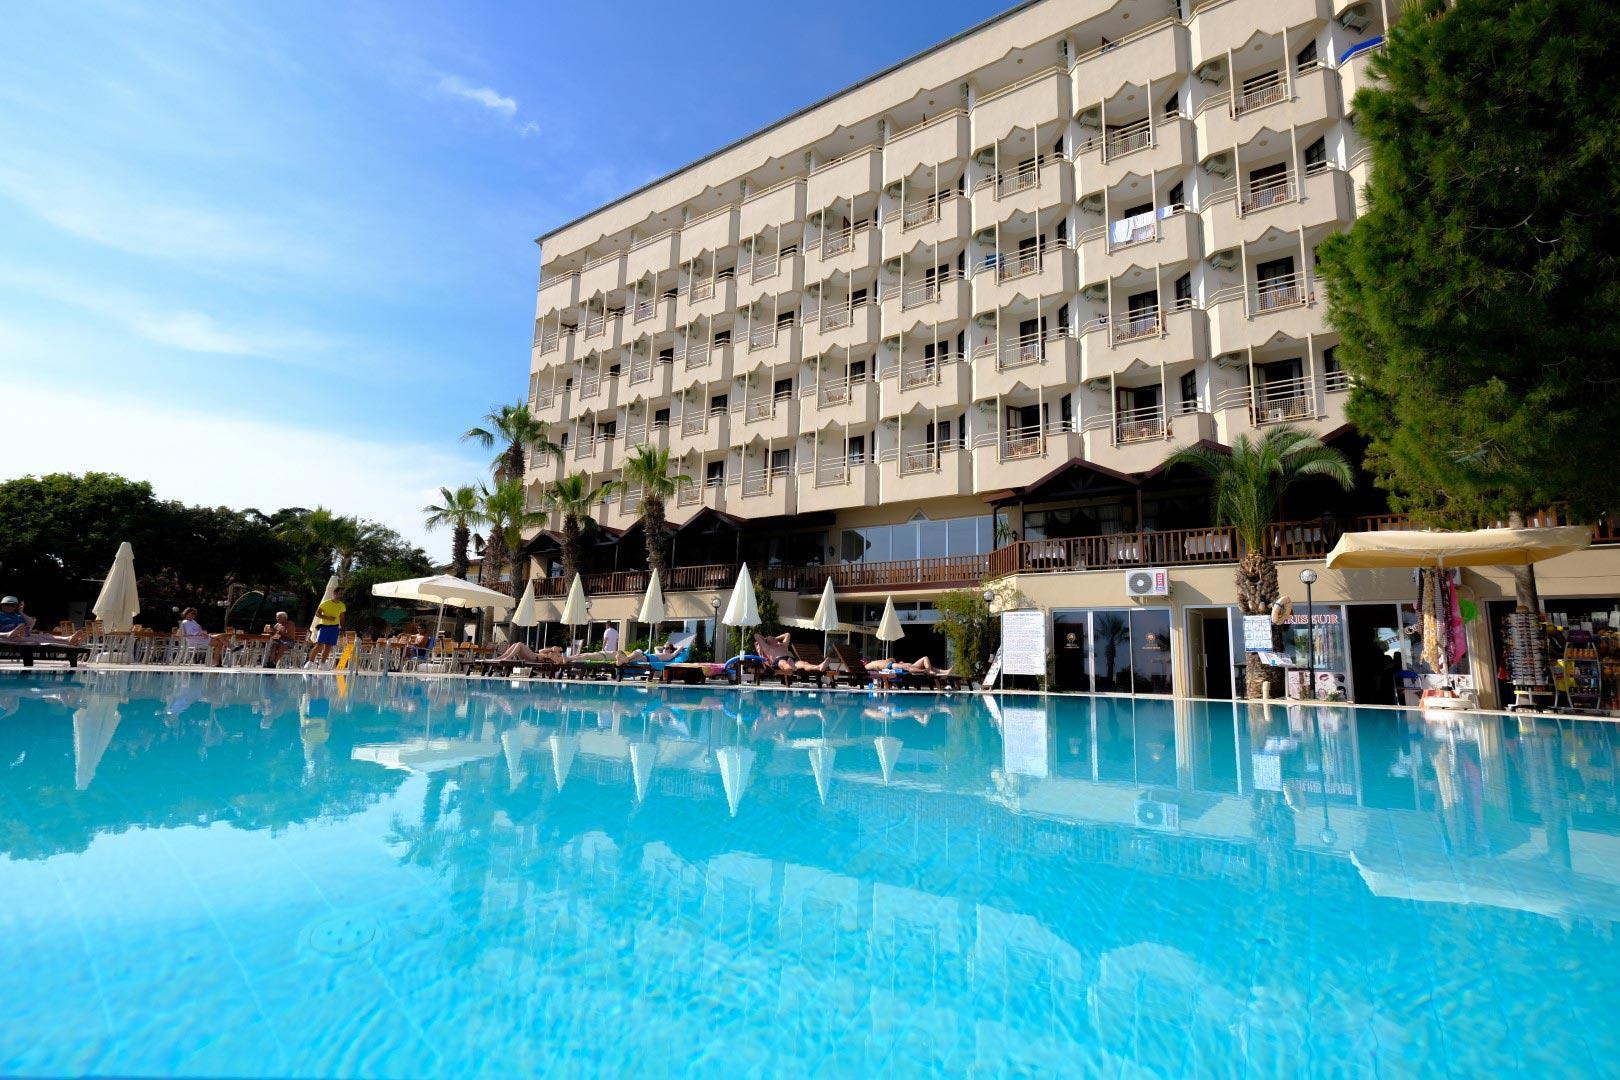 anitas-hotel-general-0018